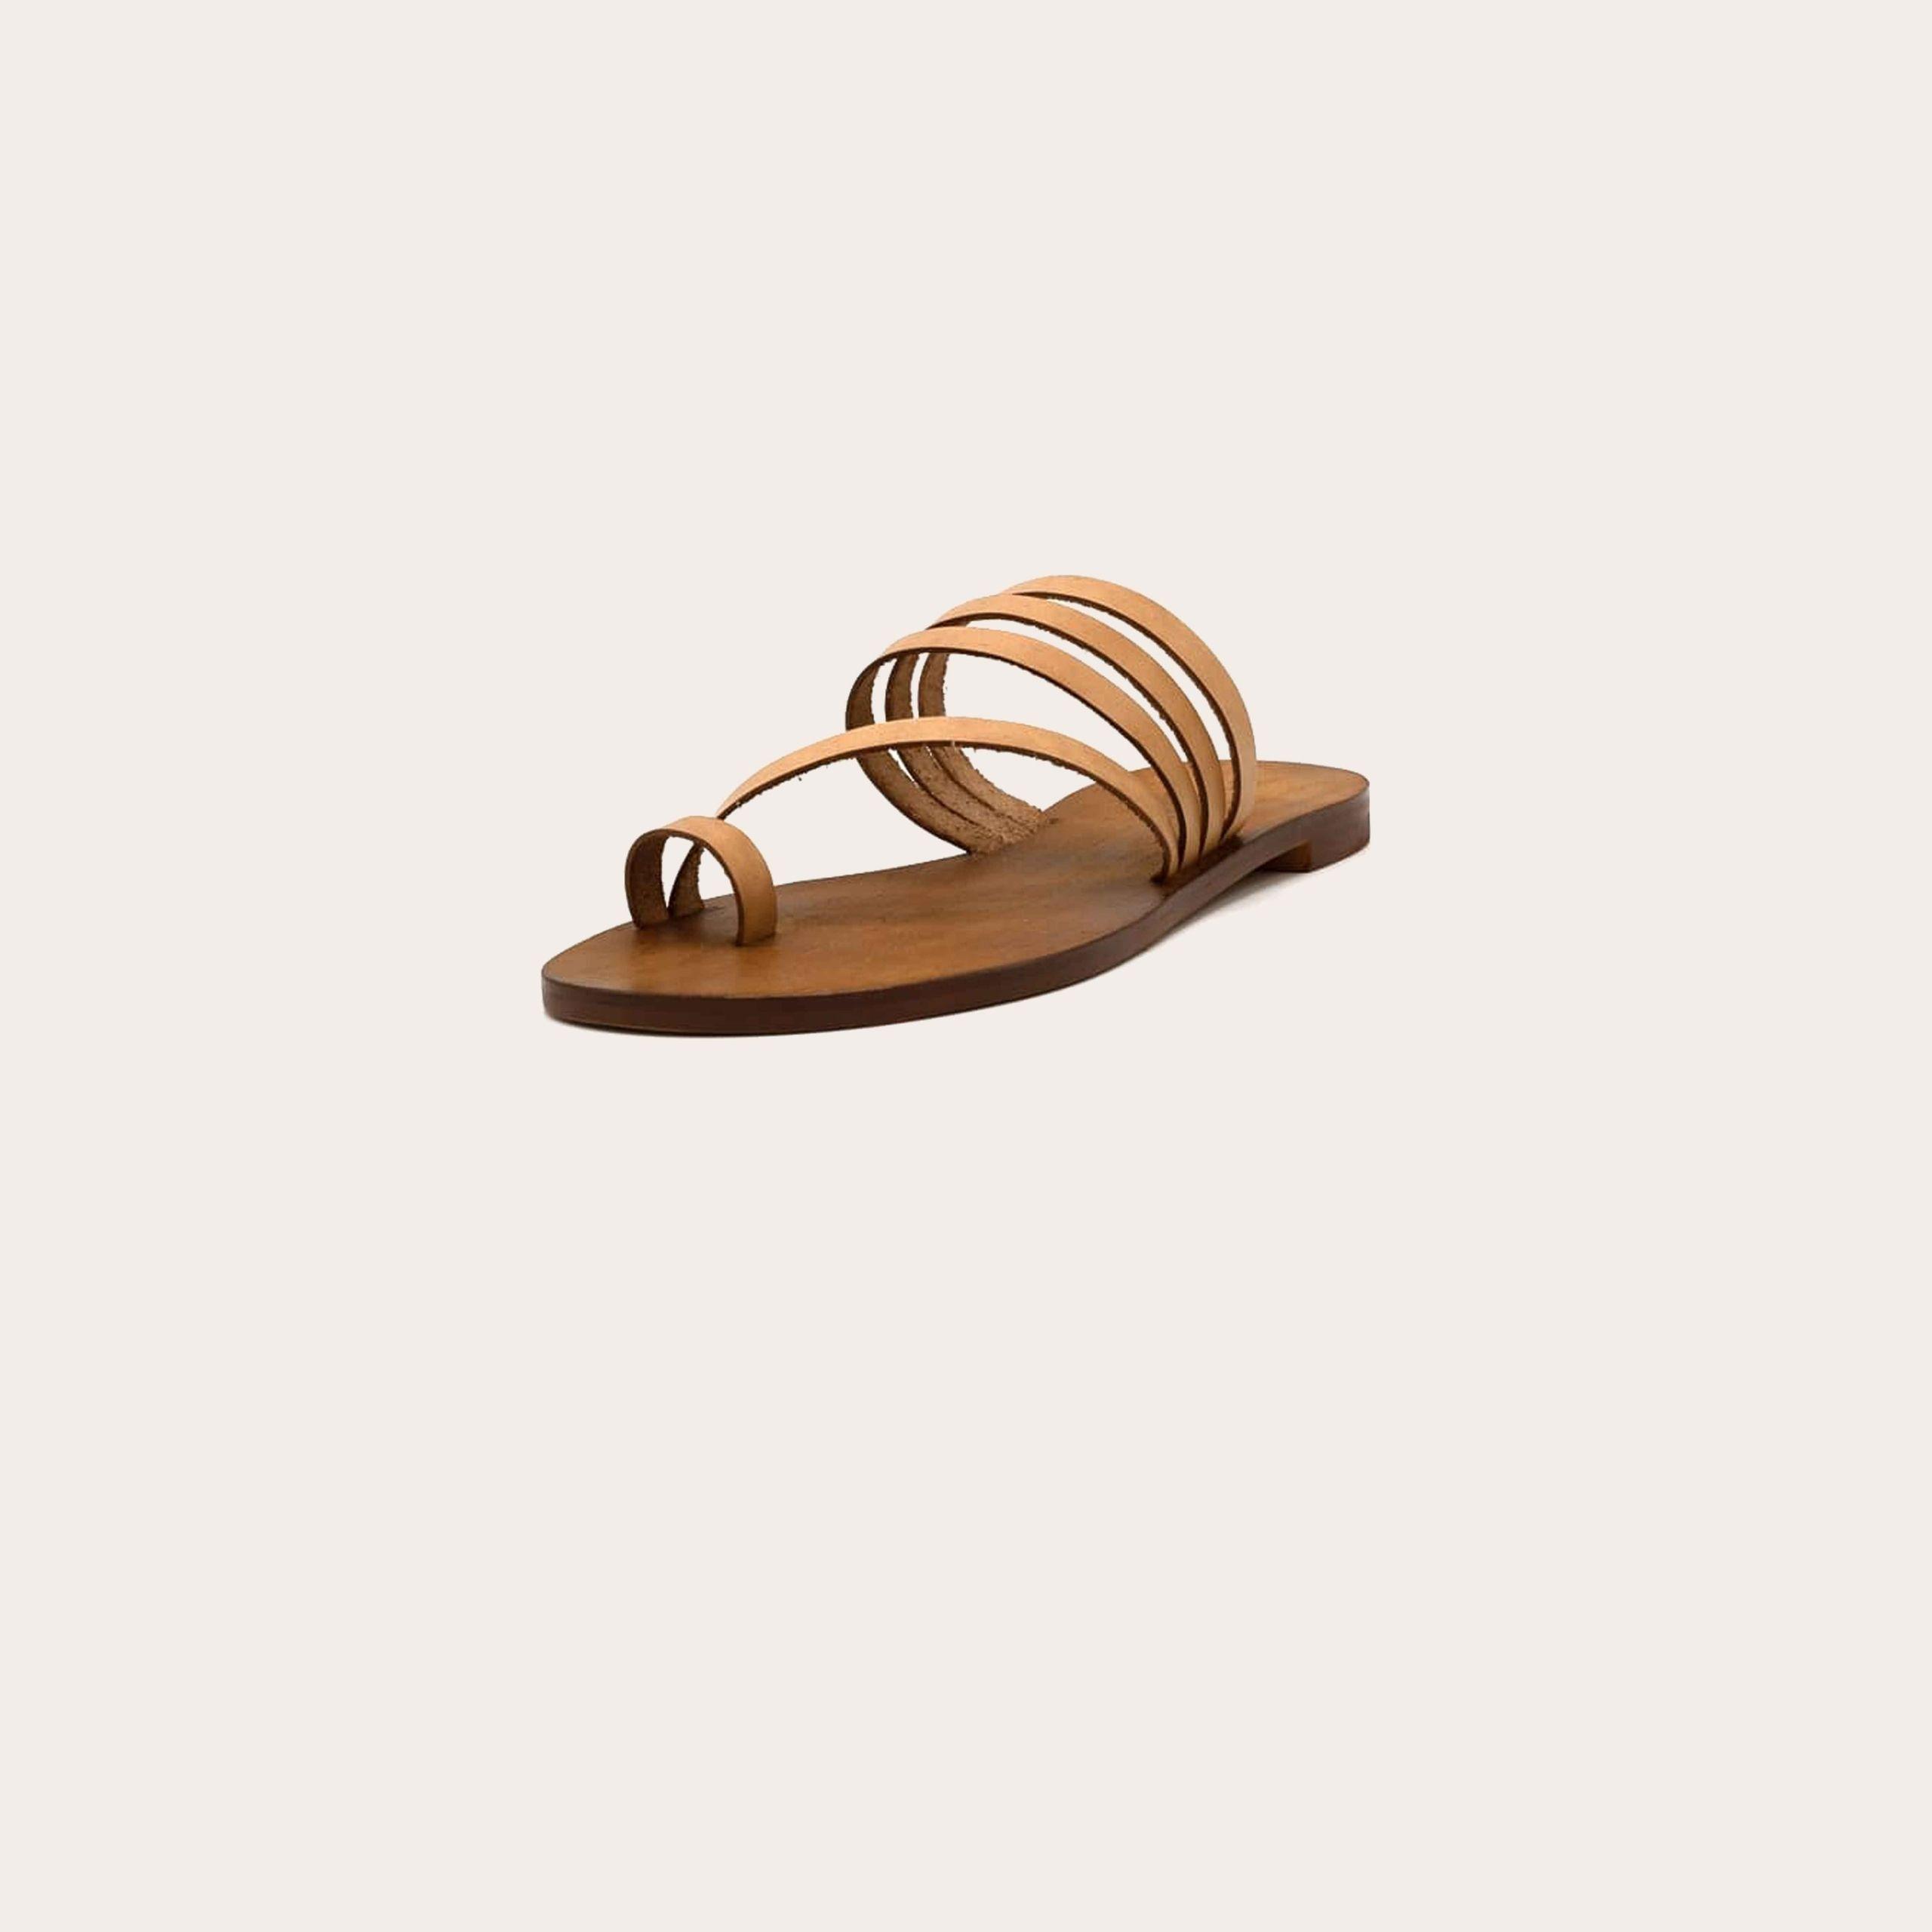 xico-beige_4_lintsandalen sandals travelsandals vegan sustainable sandals wikkelsandalen